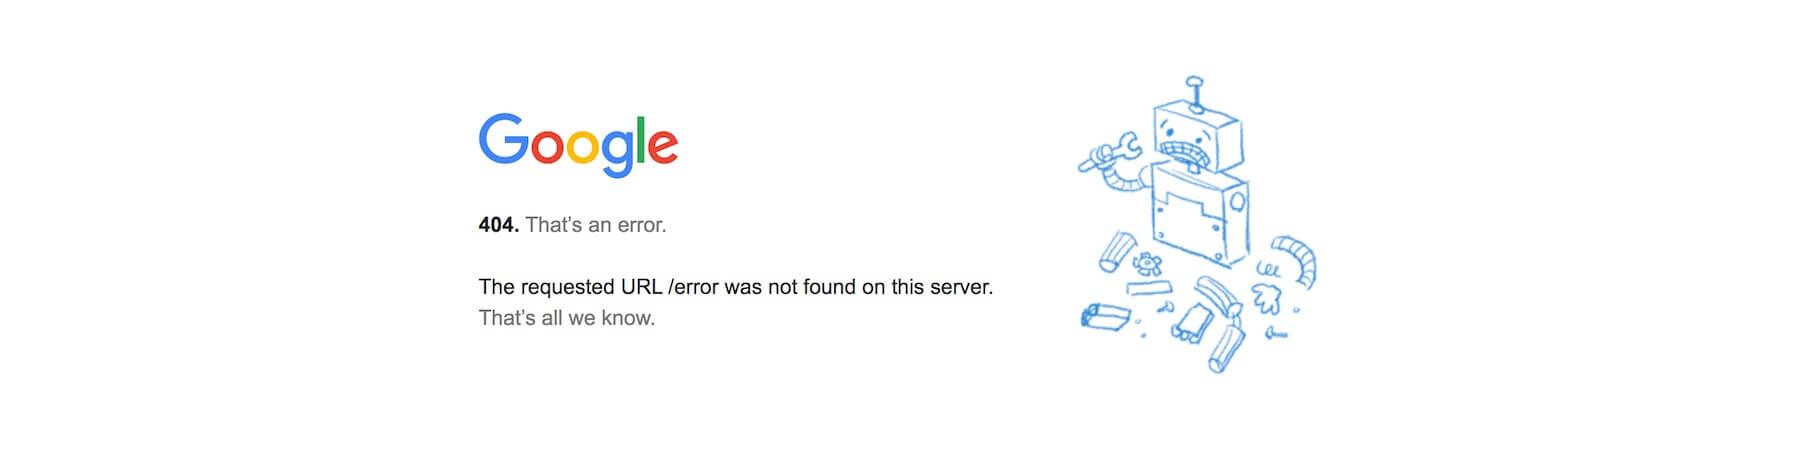 Google error page reading